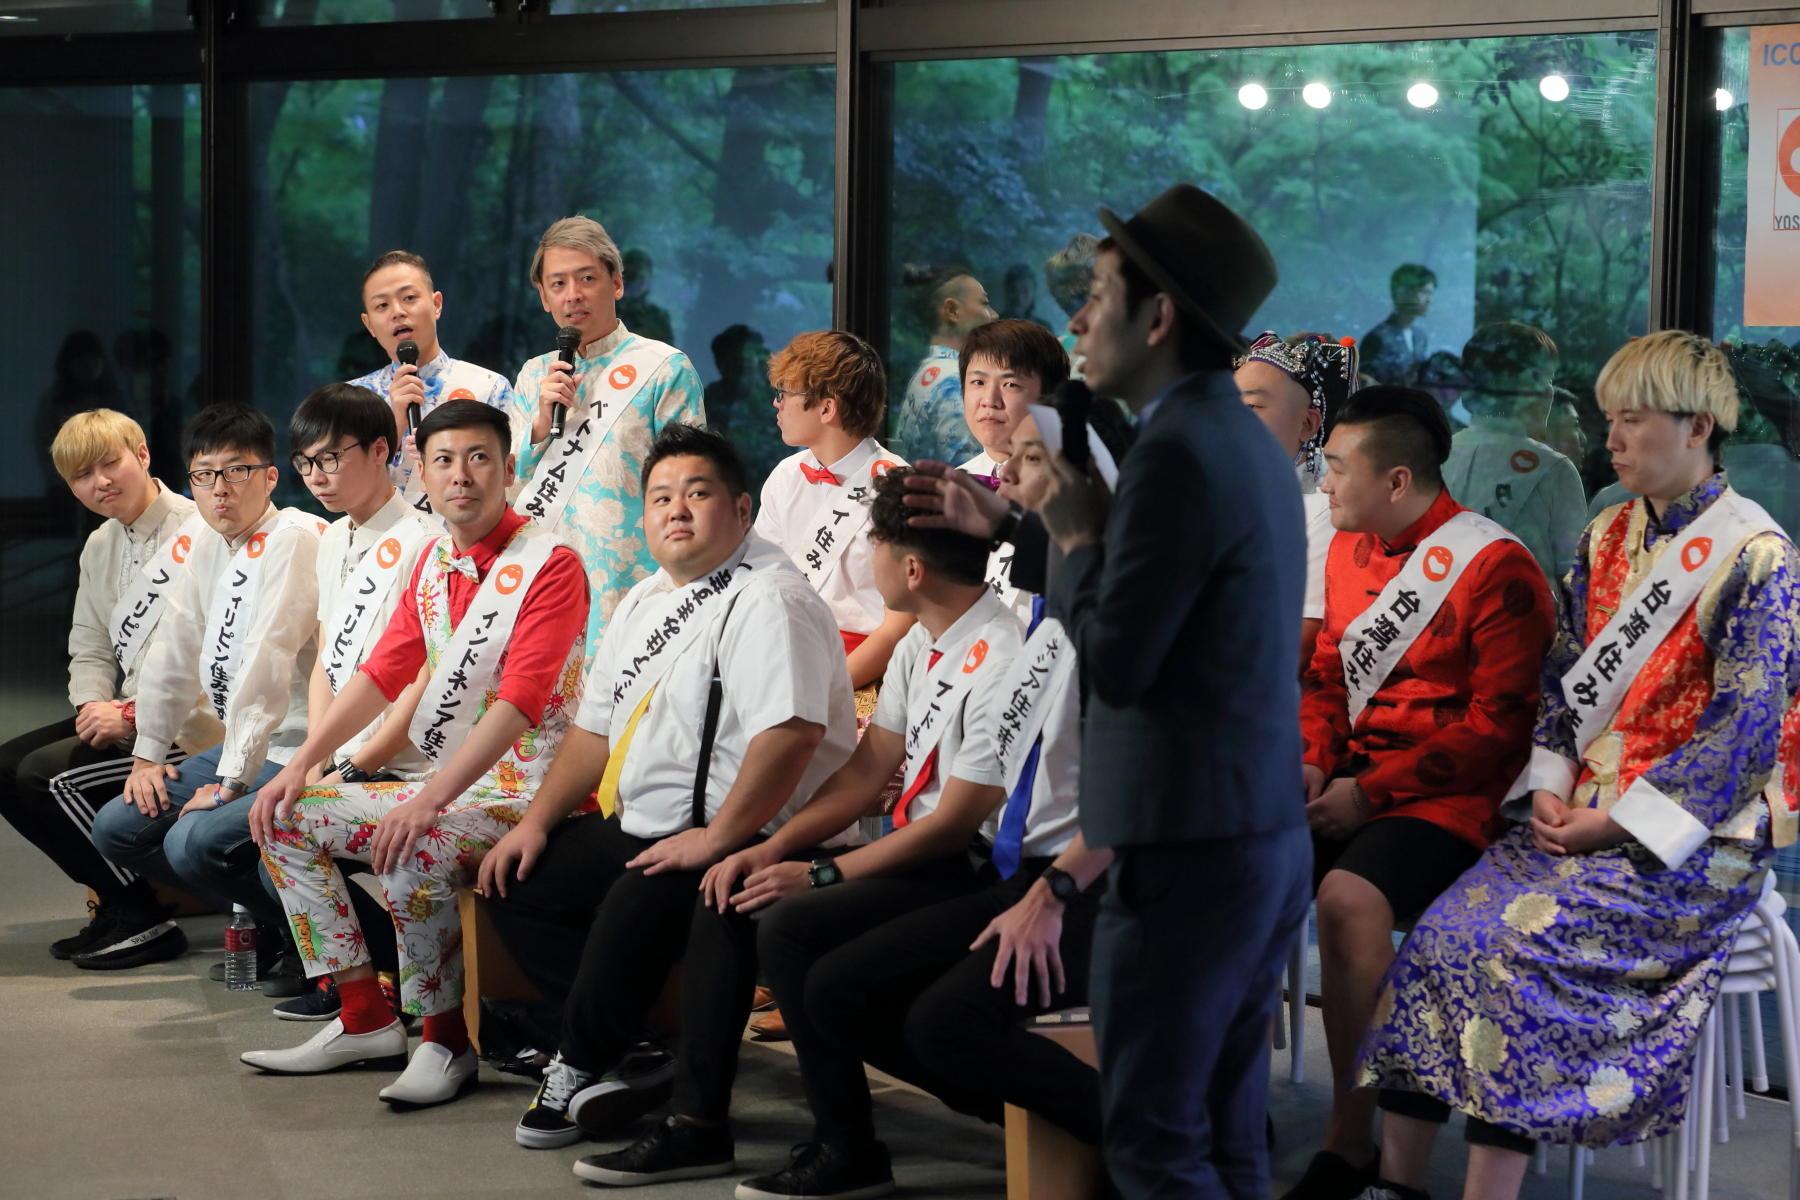 http://news.yoshimoto.co.jp/20180502054958-048b87fd5c05c30ecb41ccbd90fe1413ac5d2da2.jpg